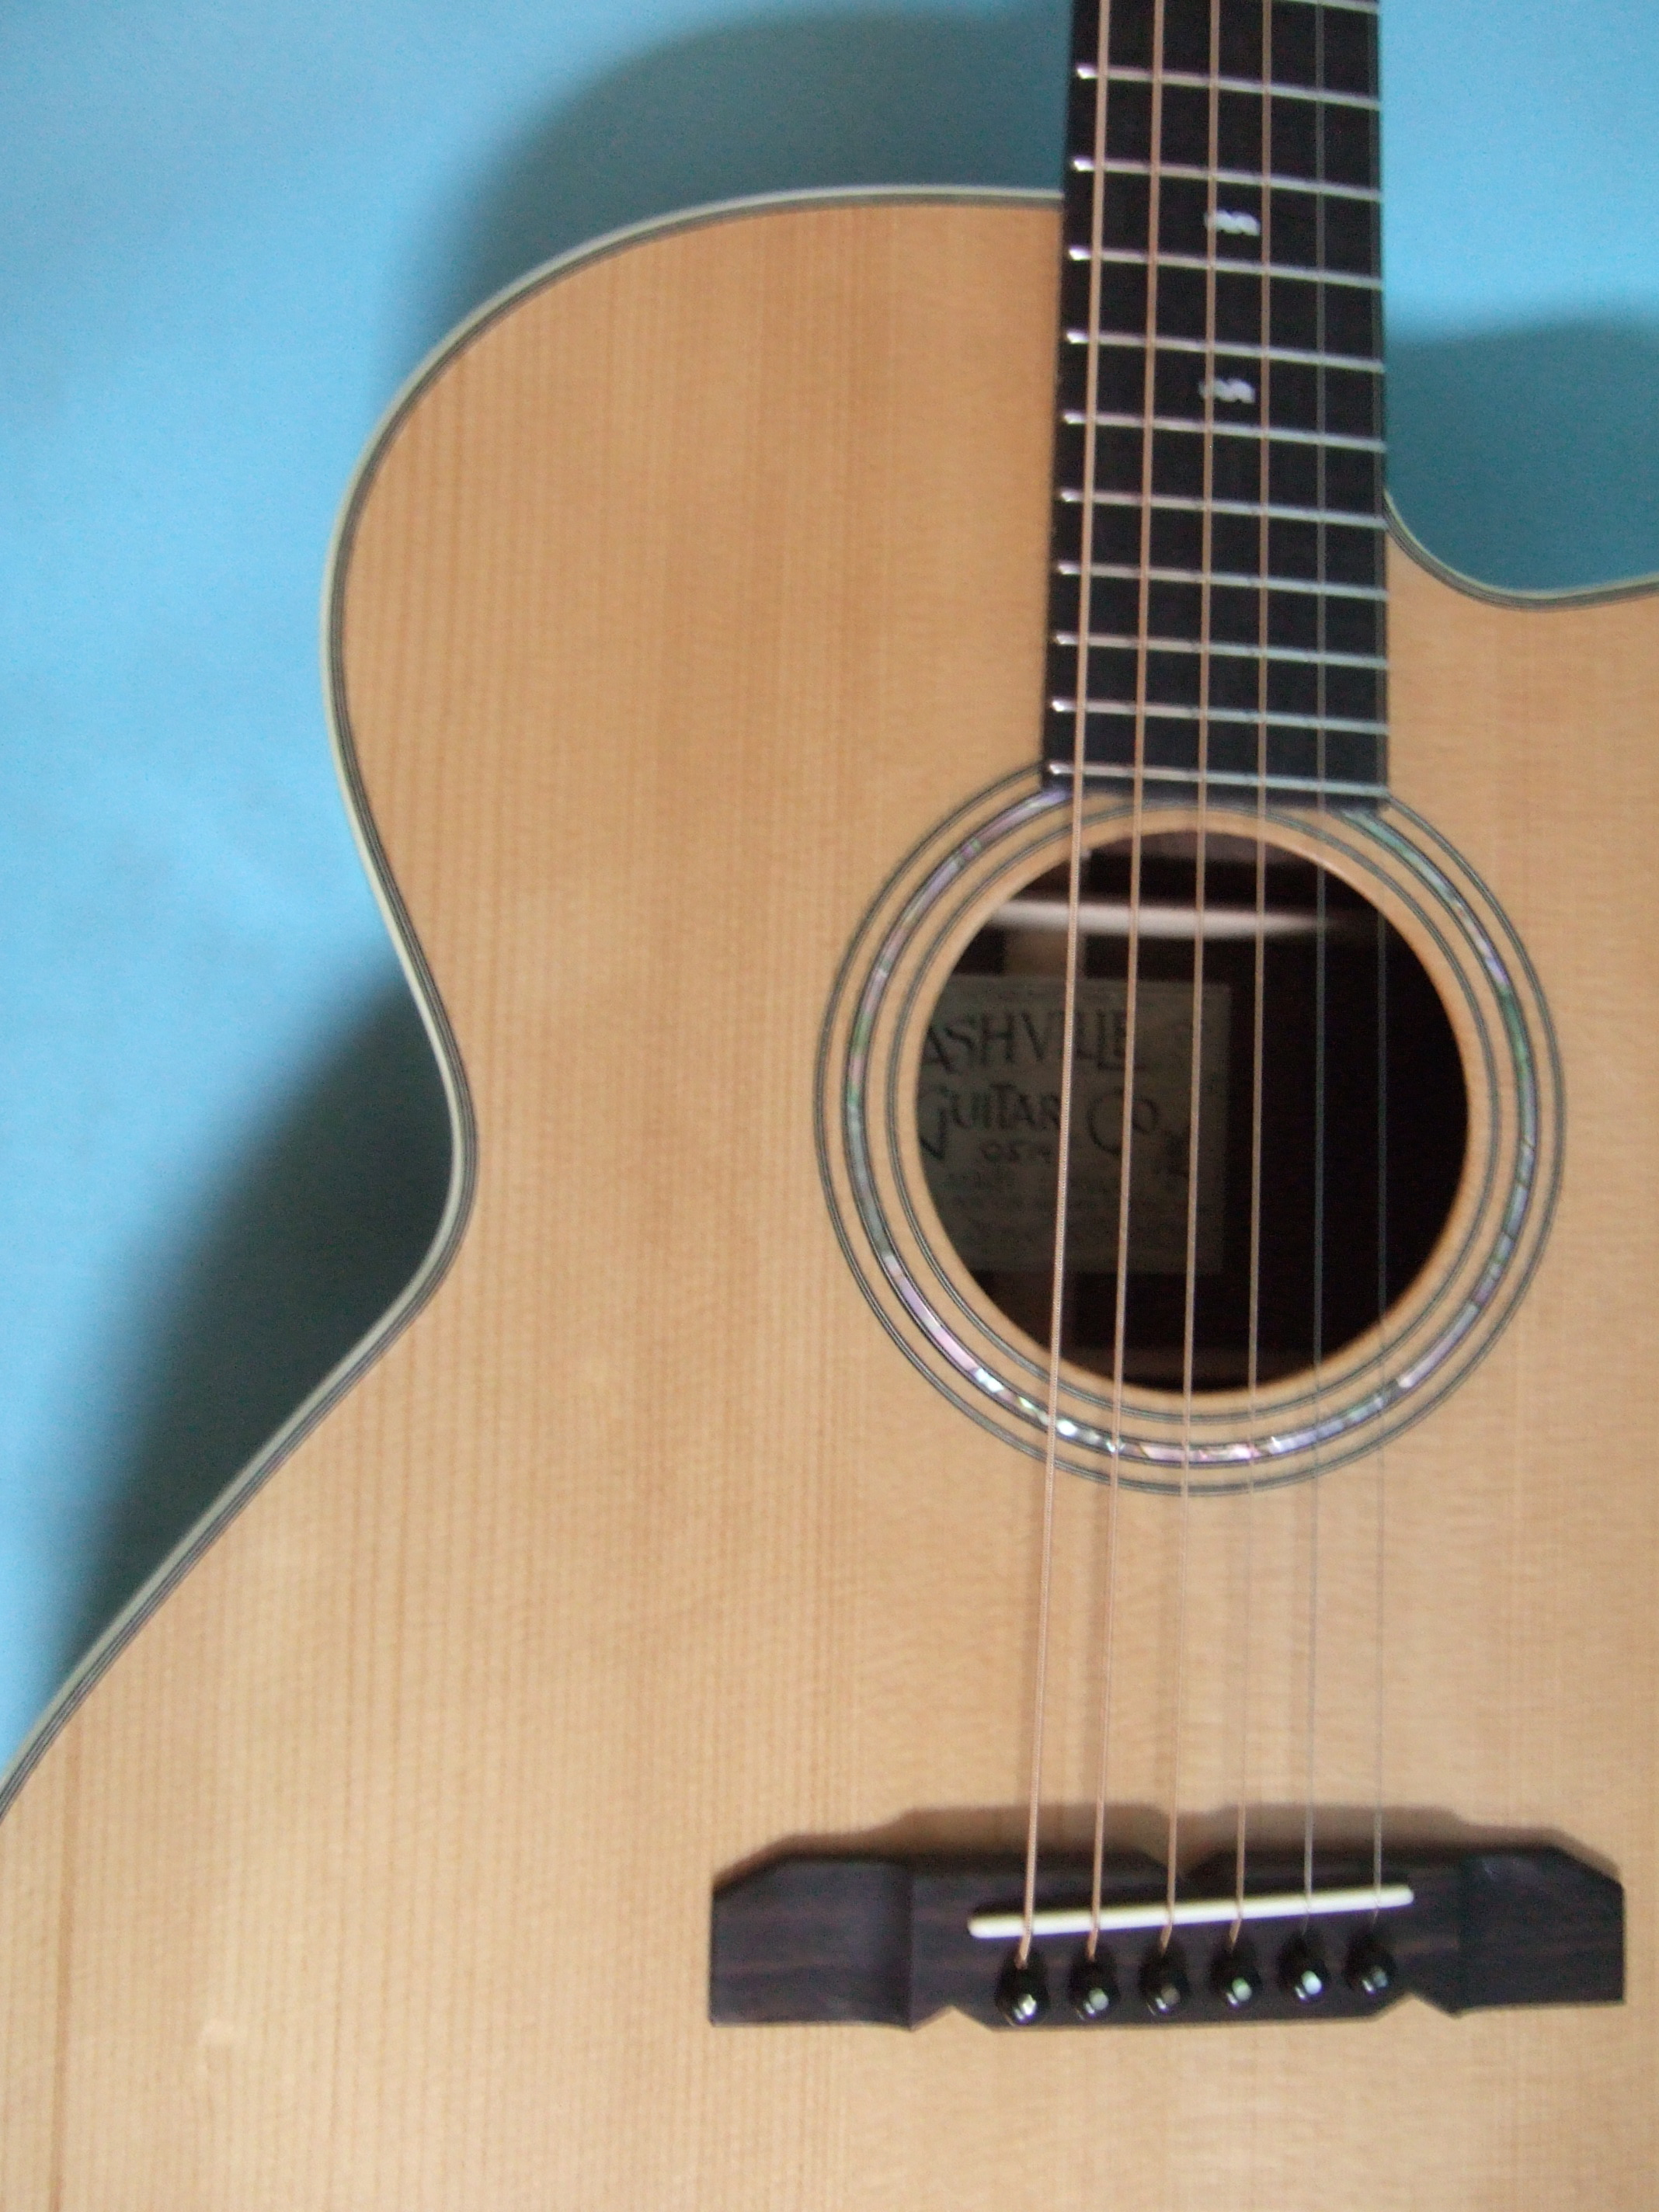 custom guitars nashville guitar company. Black Bedroom Furniture Sets. Home Design Ideas